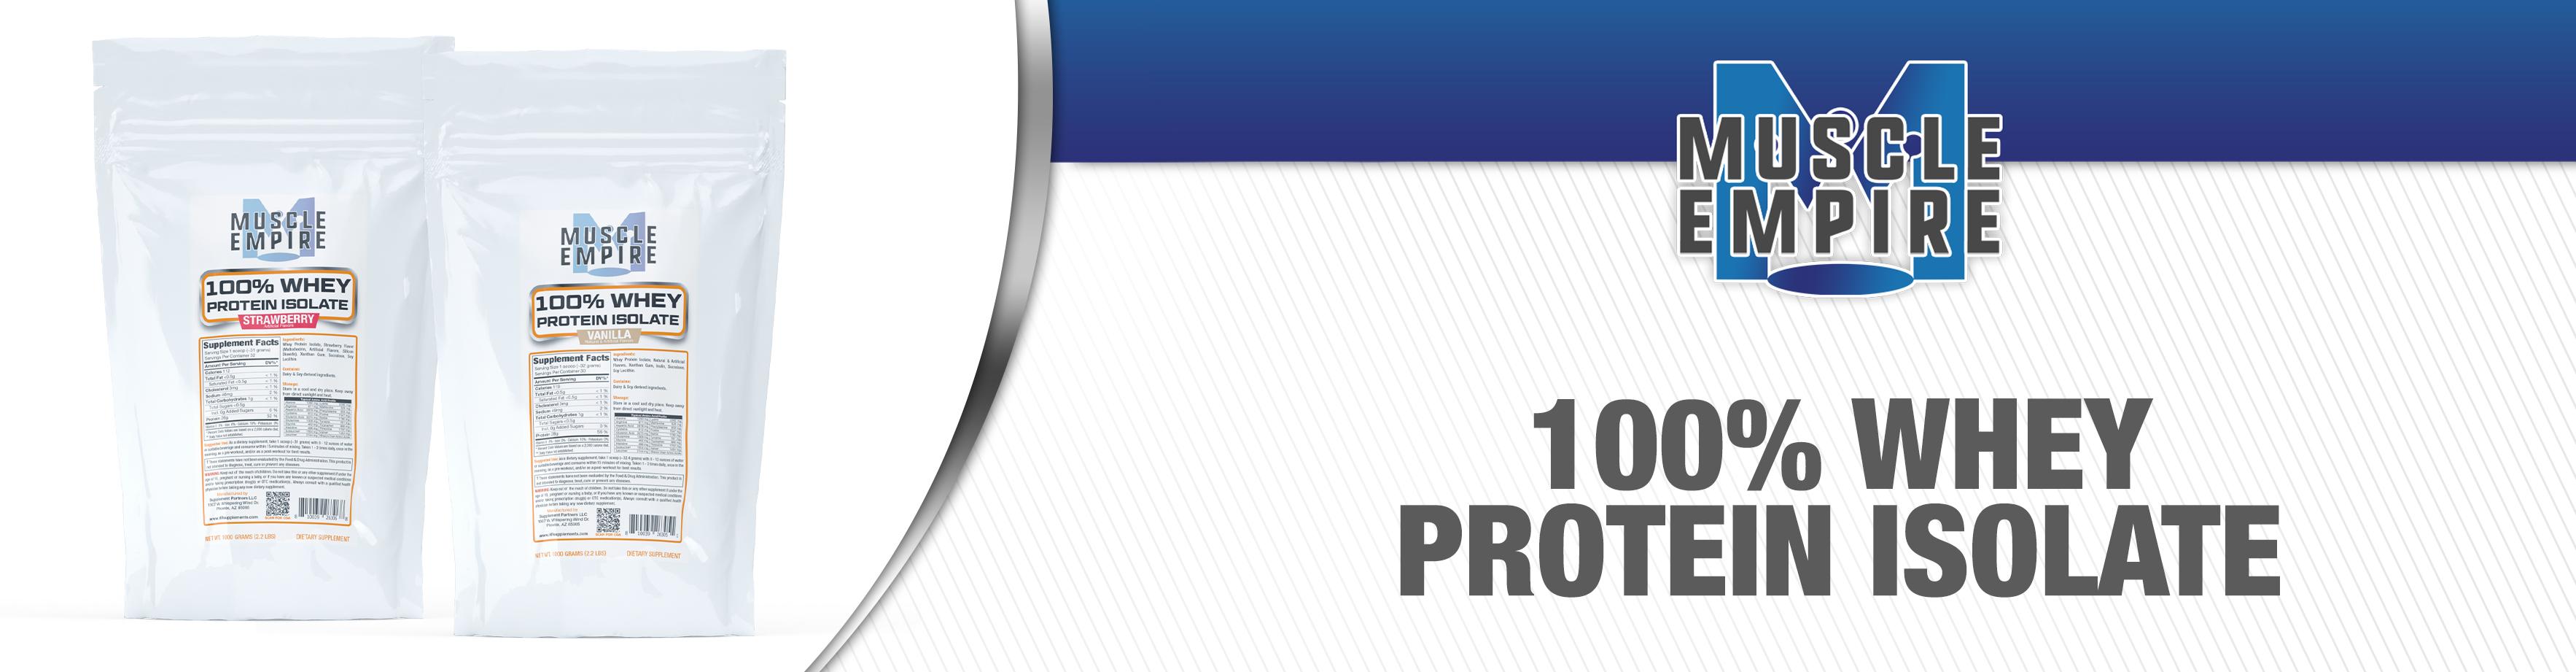 whey-protein-isolate-powder-10-21.jpg